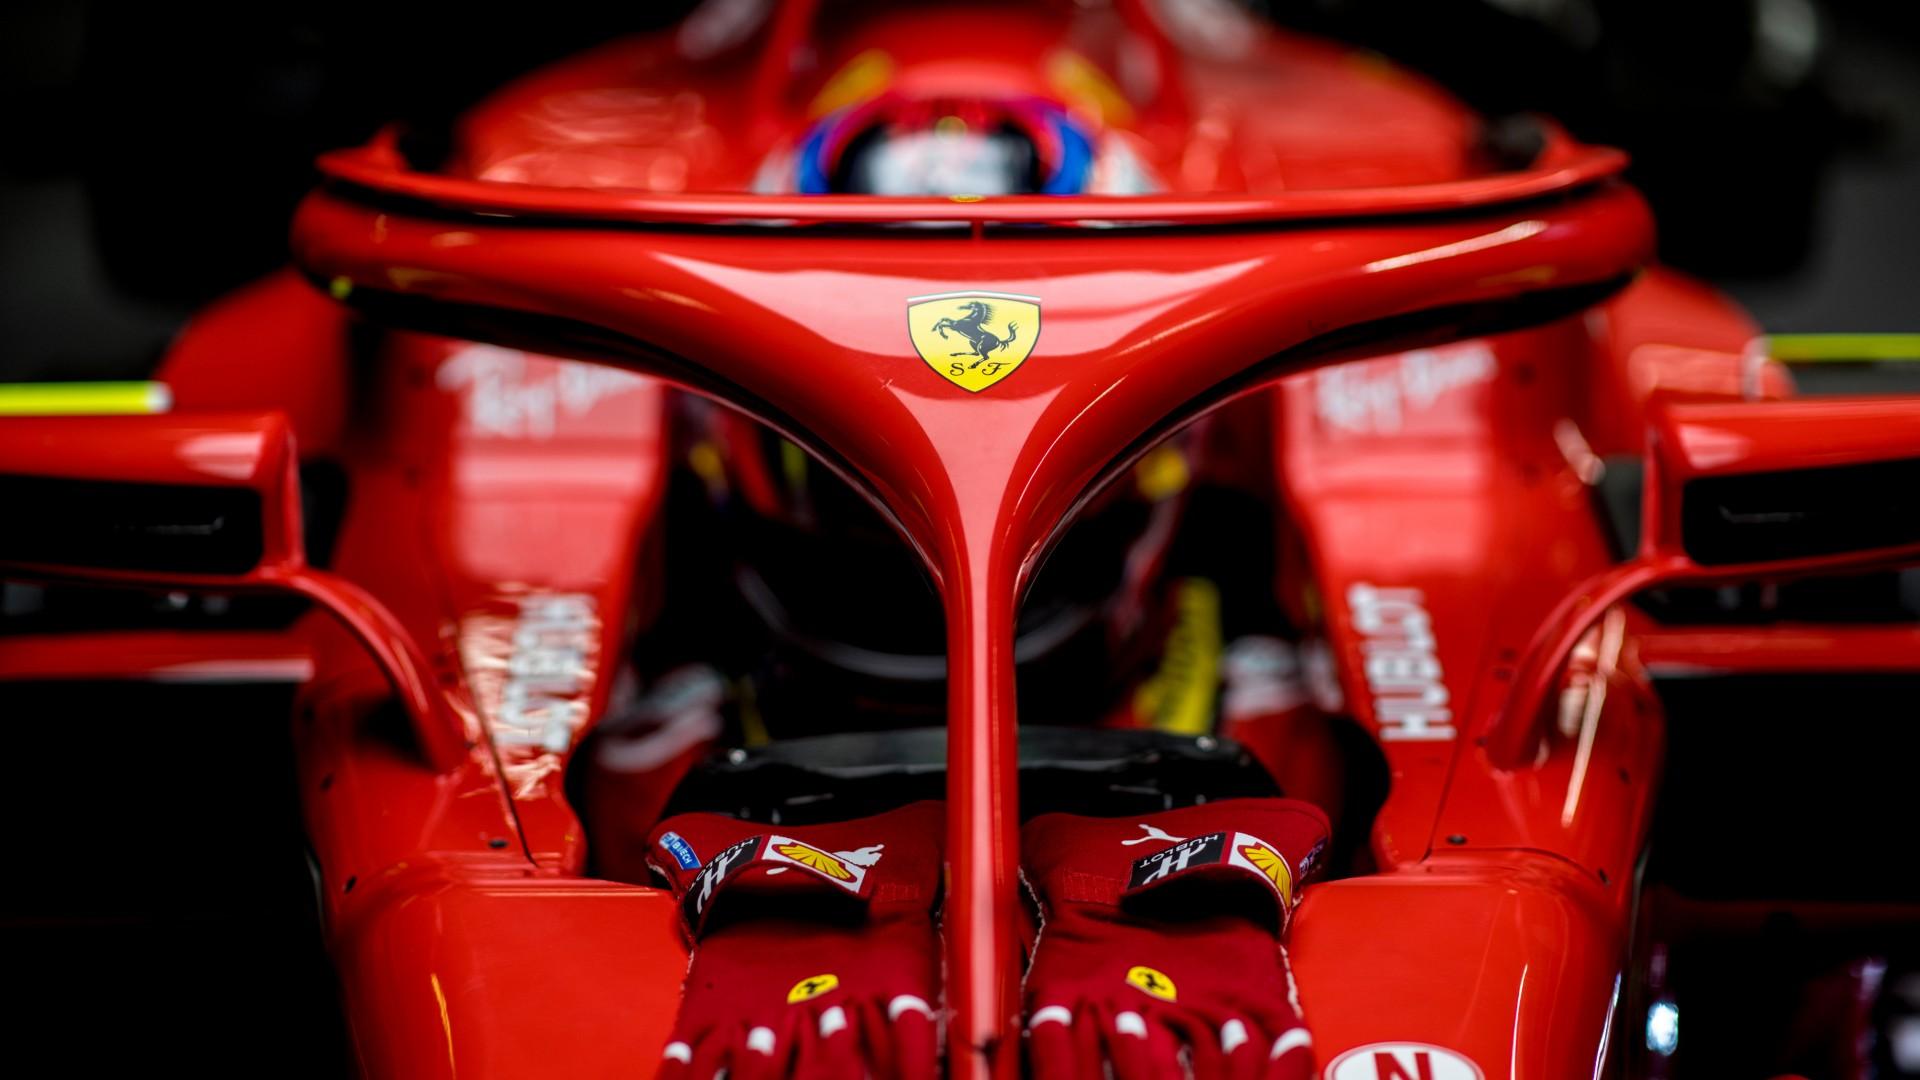 2 Monitor Wallpaper Hd 2018 Ferrari Sf71h F1 Formula 1 4k 3 Wallpaper Hd Car